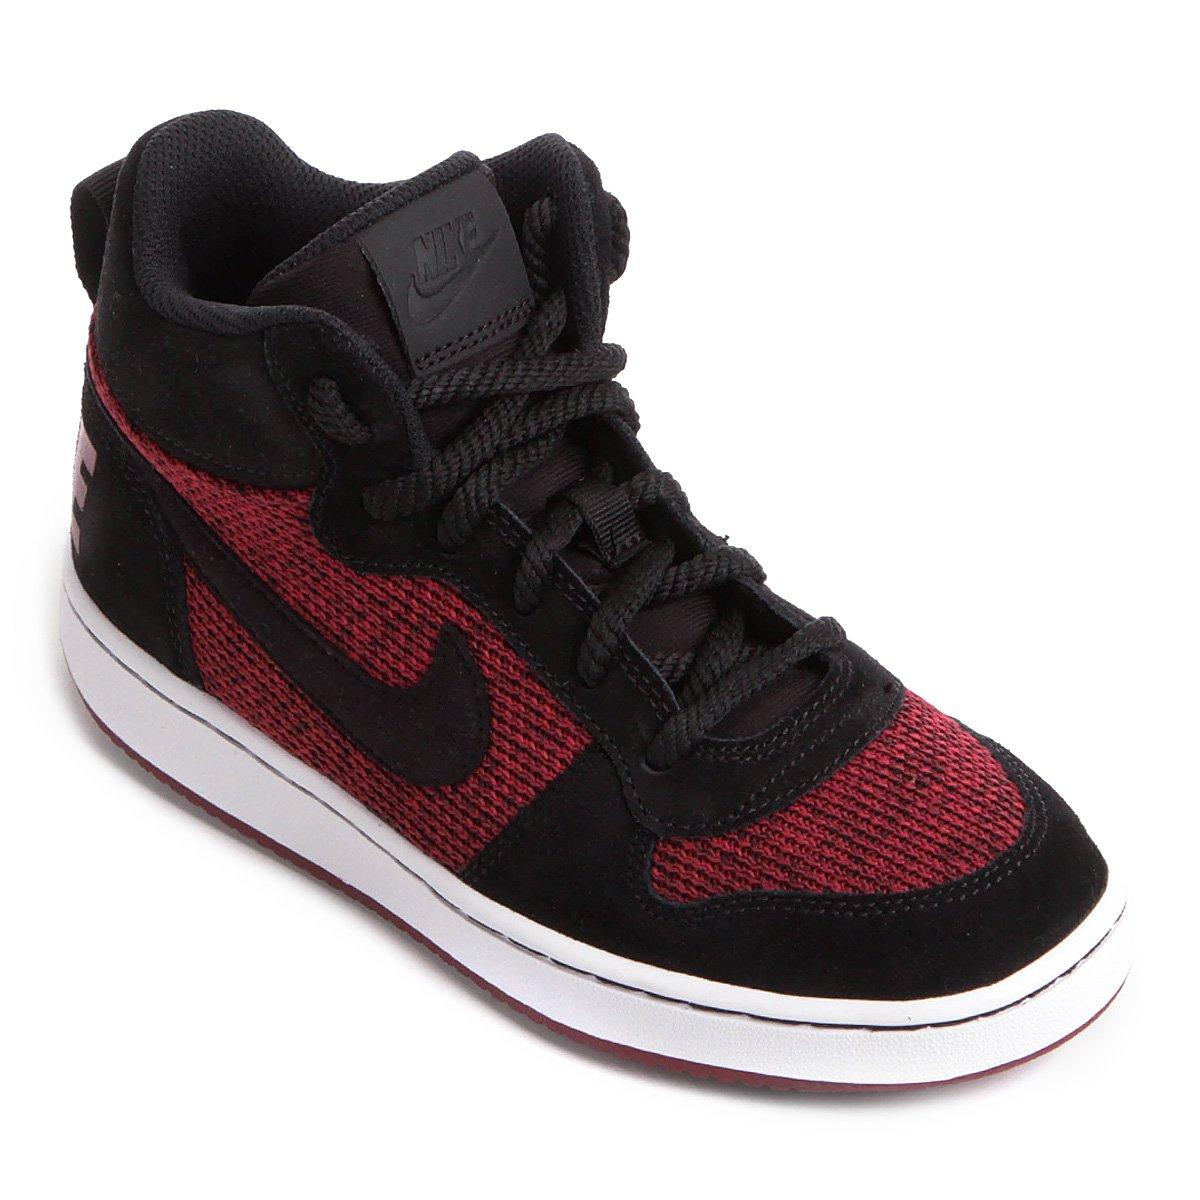 9b6563b3d94a7 Tênis Infantil Couro Cano Alto Nike Court Borough Mid Se Masculino |  Netshoes